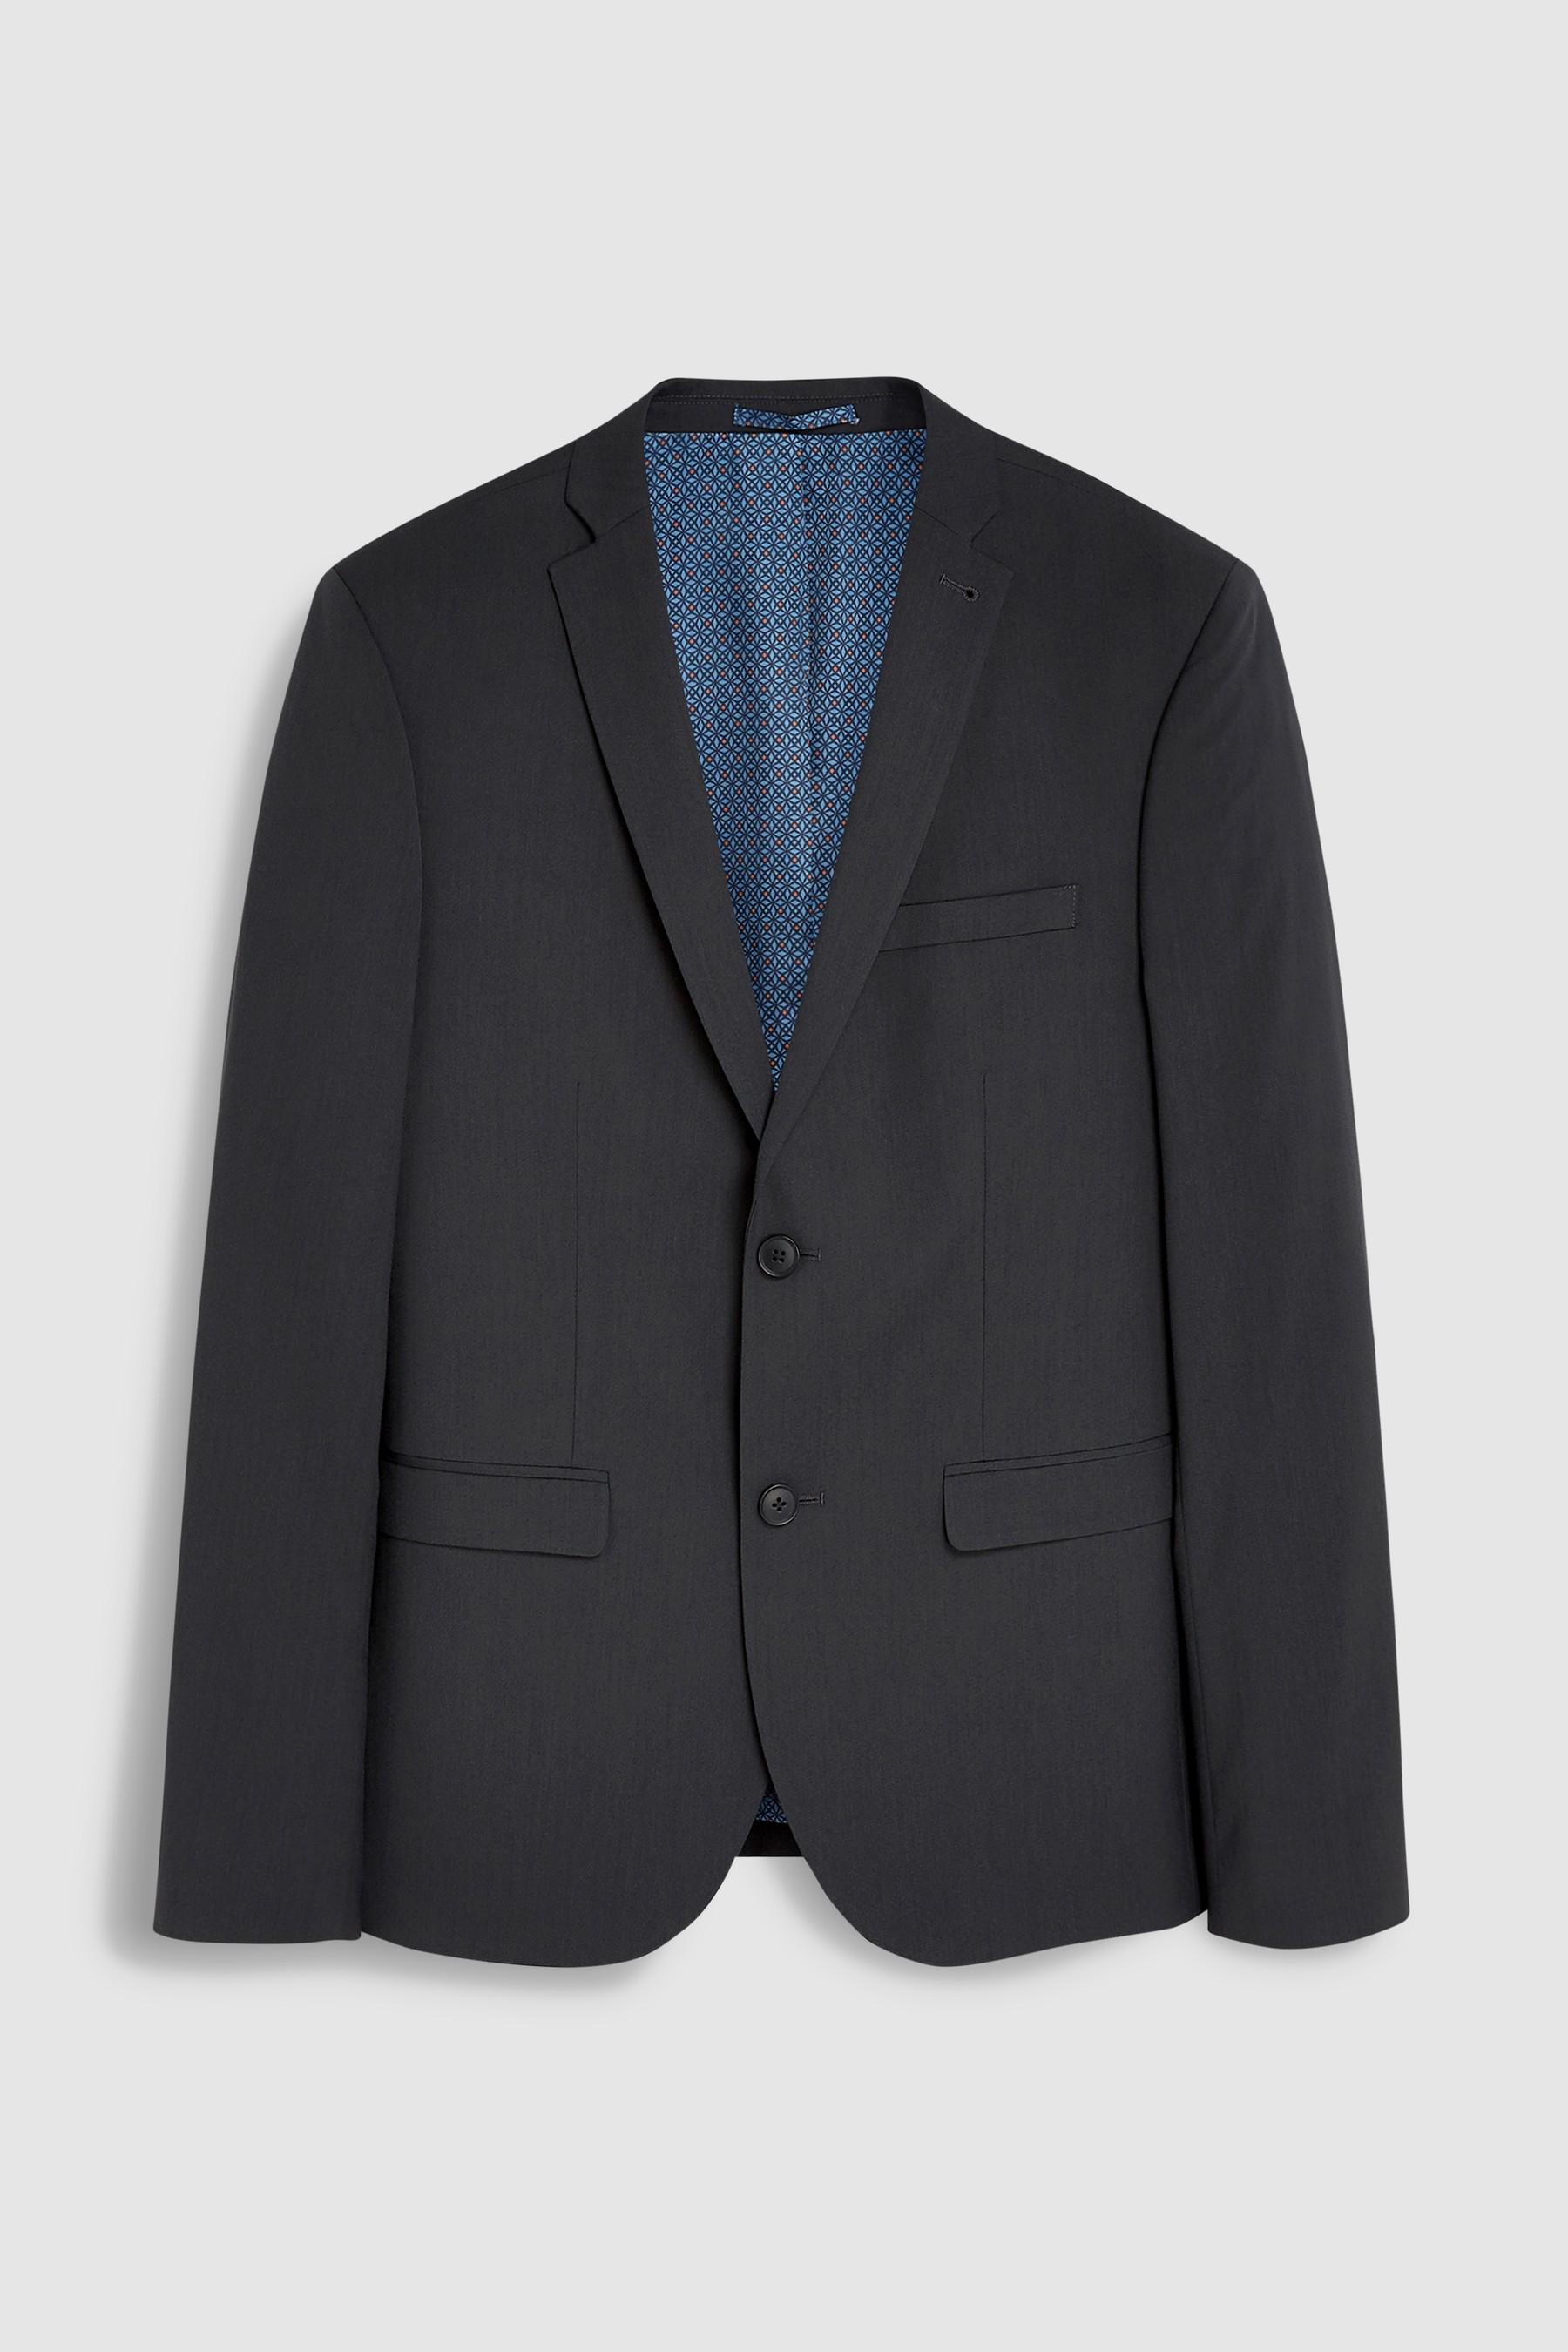 6af130b664f Mens Next Charcoal Super Skinny Fit Stretch Tonic Suit  Jacket - Grey